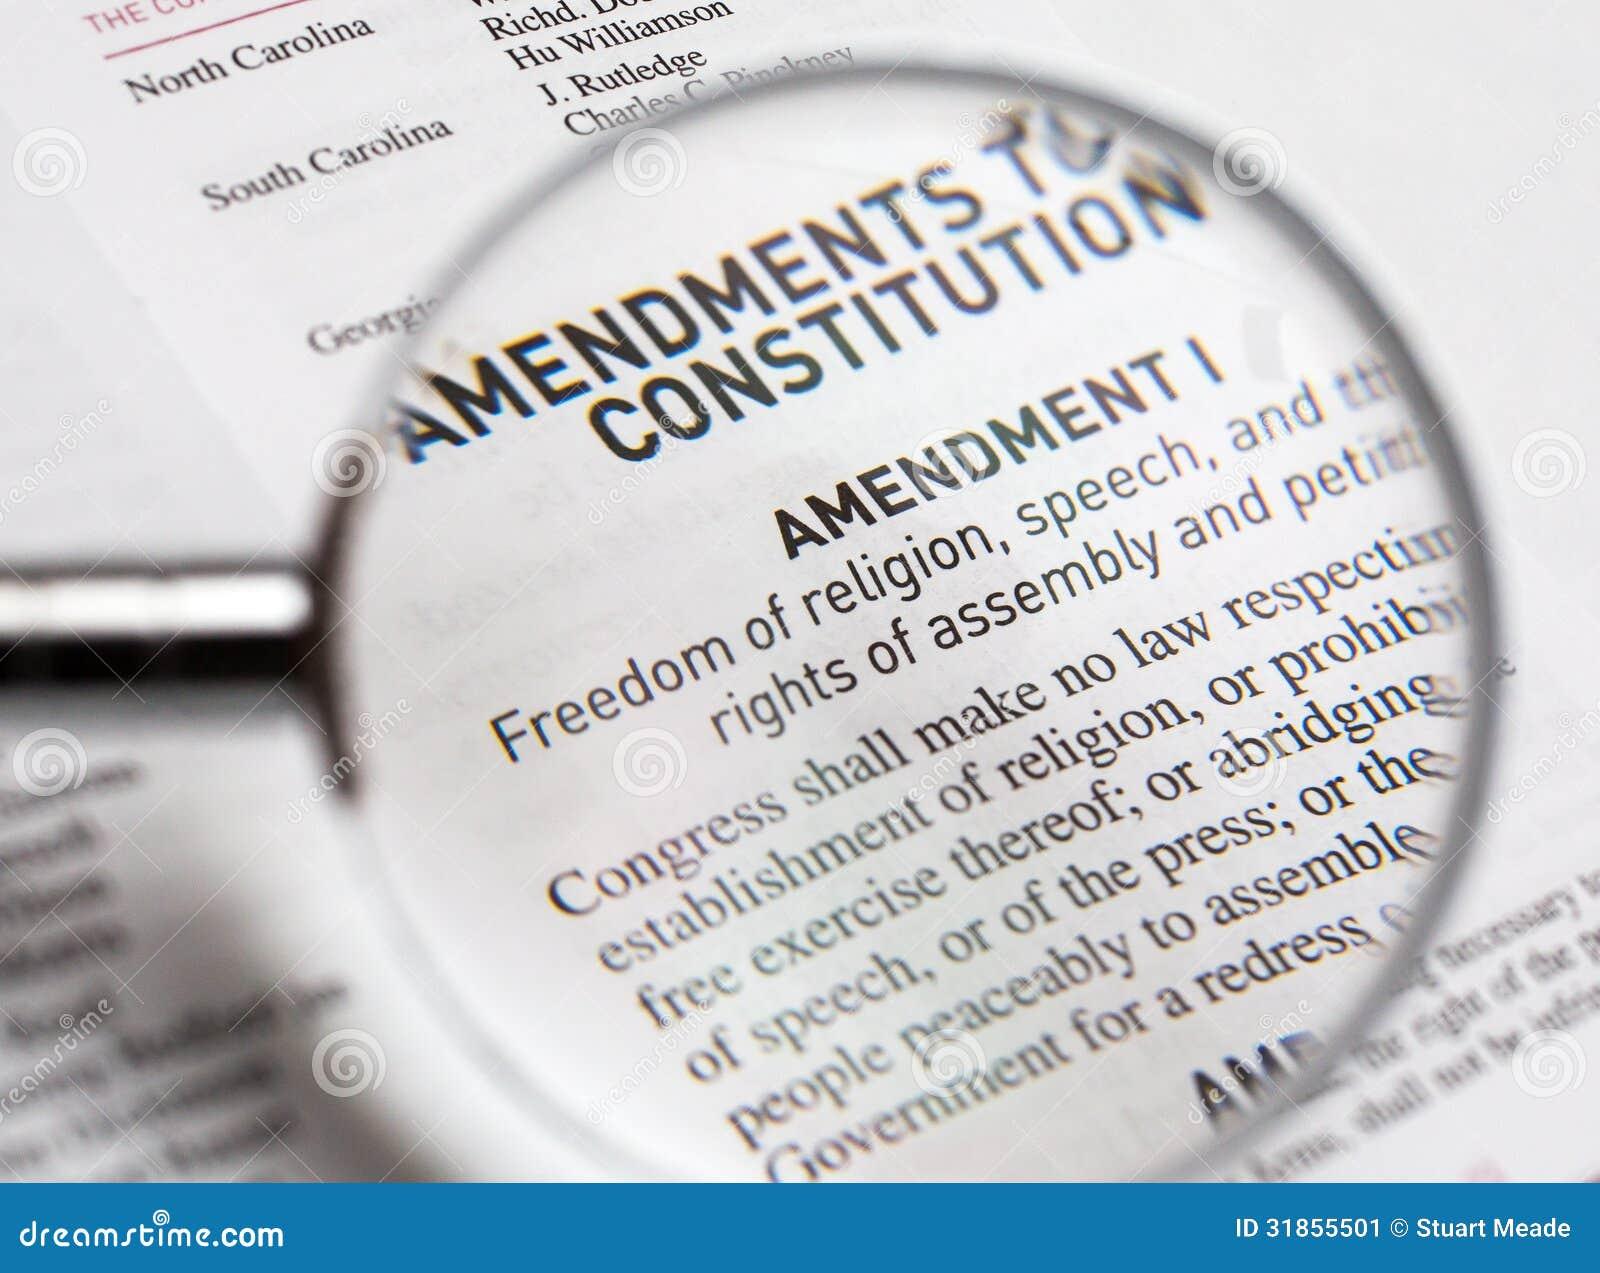 Us constitution freedom of speech